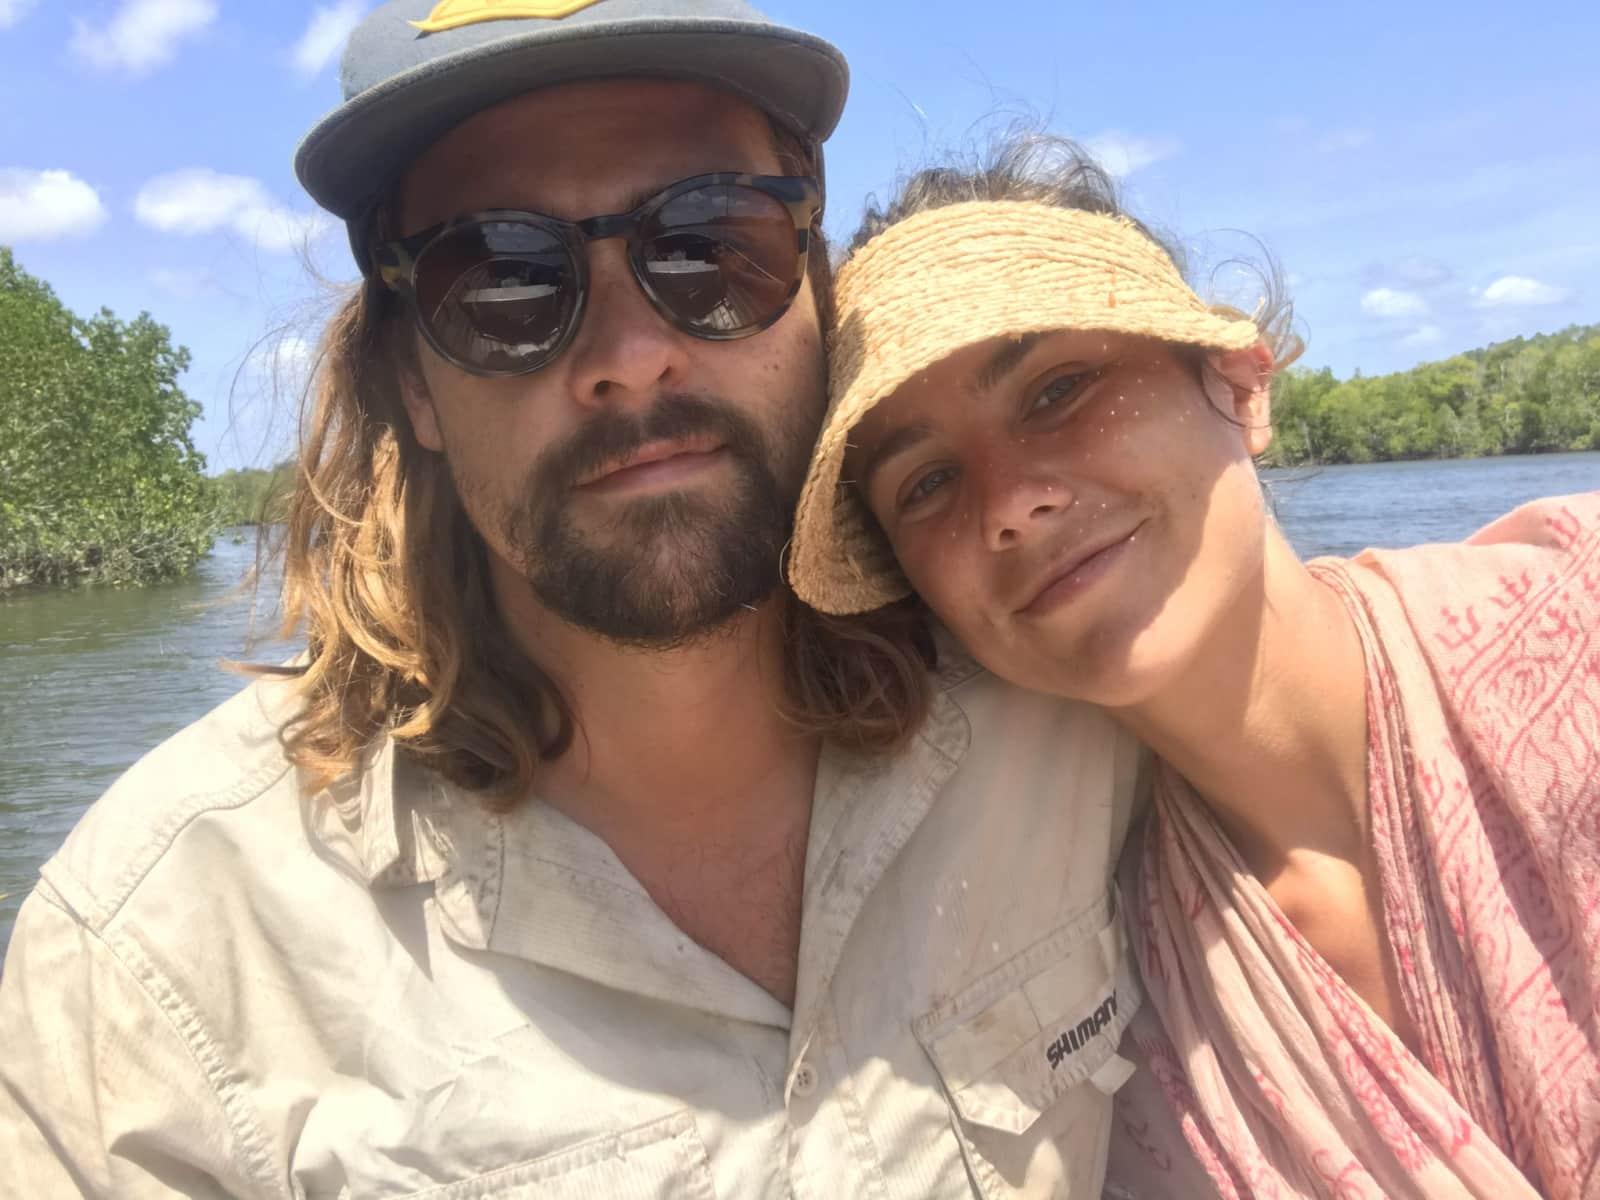 Ella & Mark from Darwin, Northern Territory, Australia